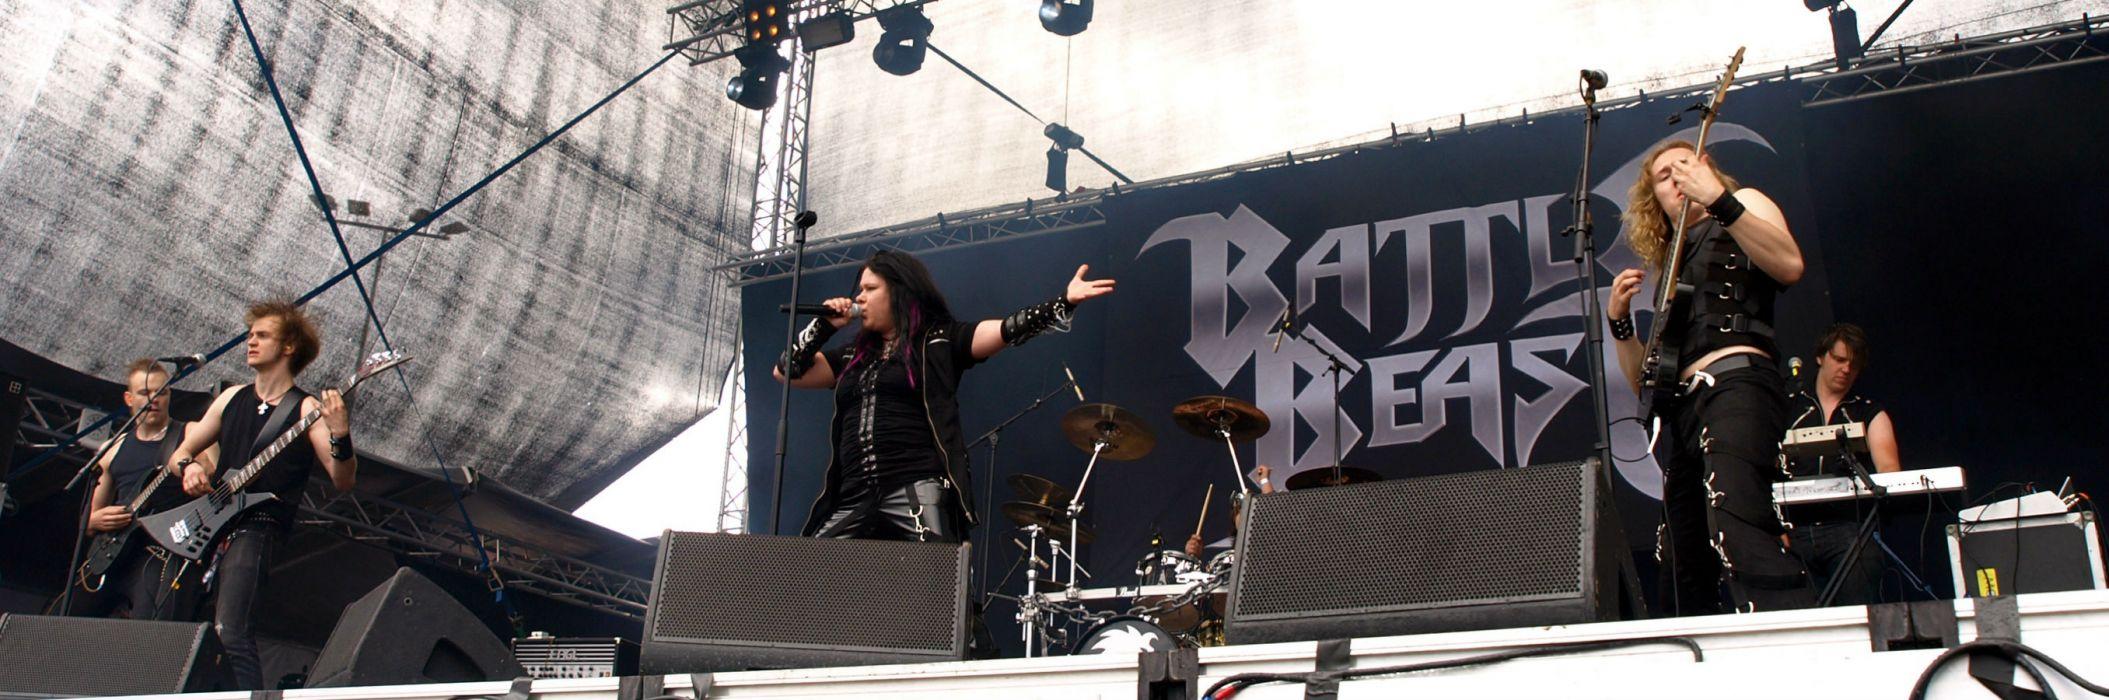 Battle Beast heavy metal concert guitar     rt wallpaper